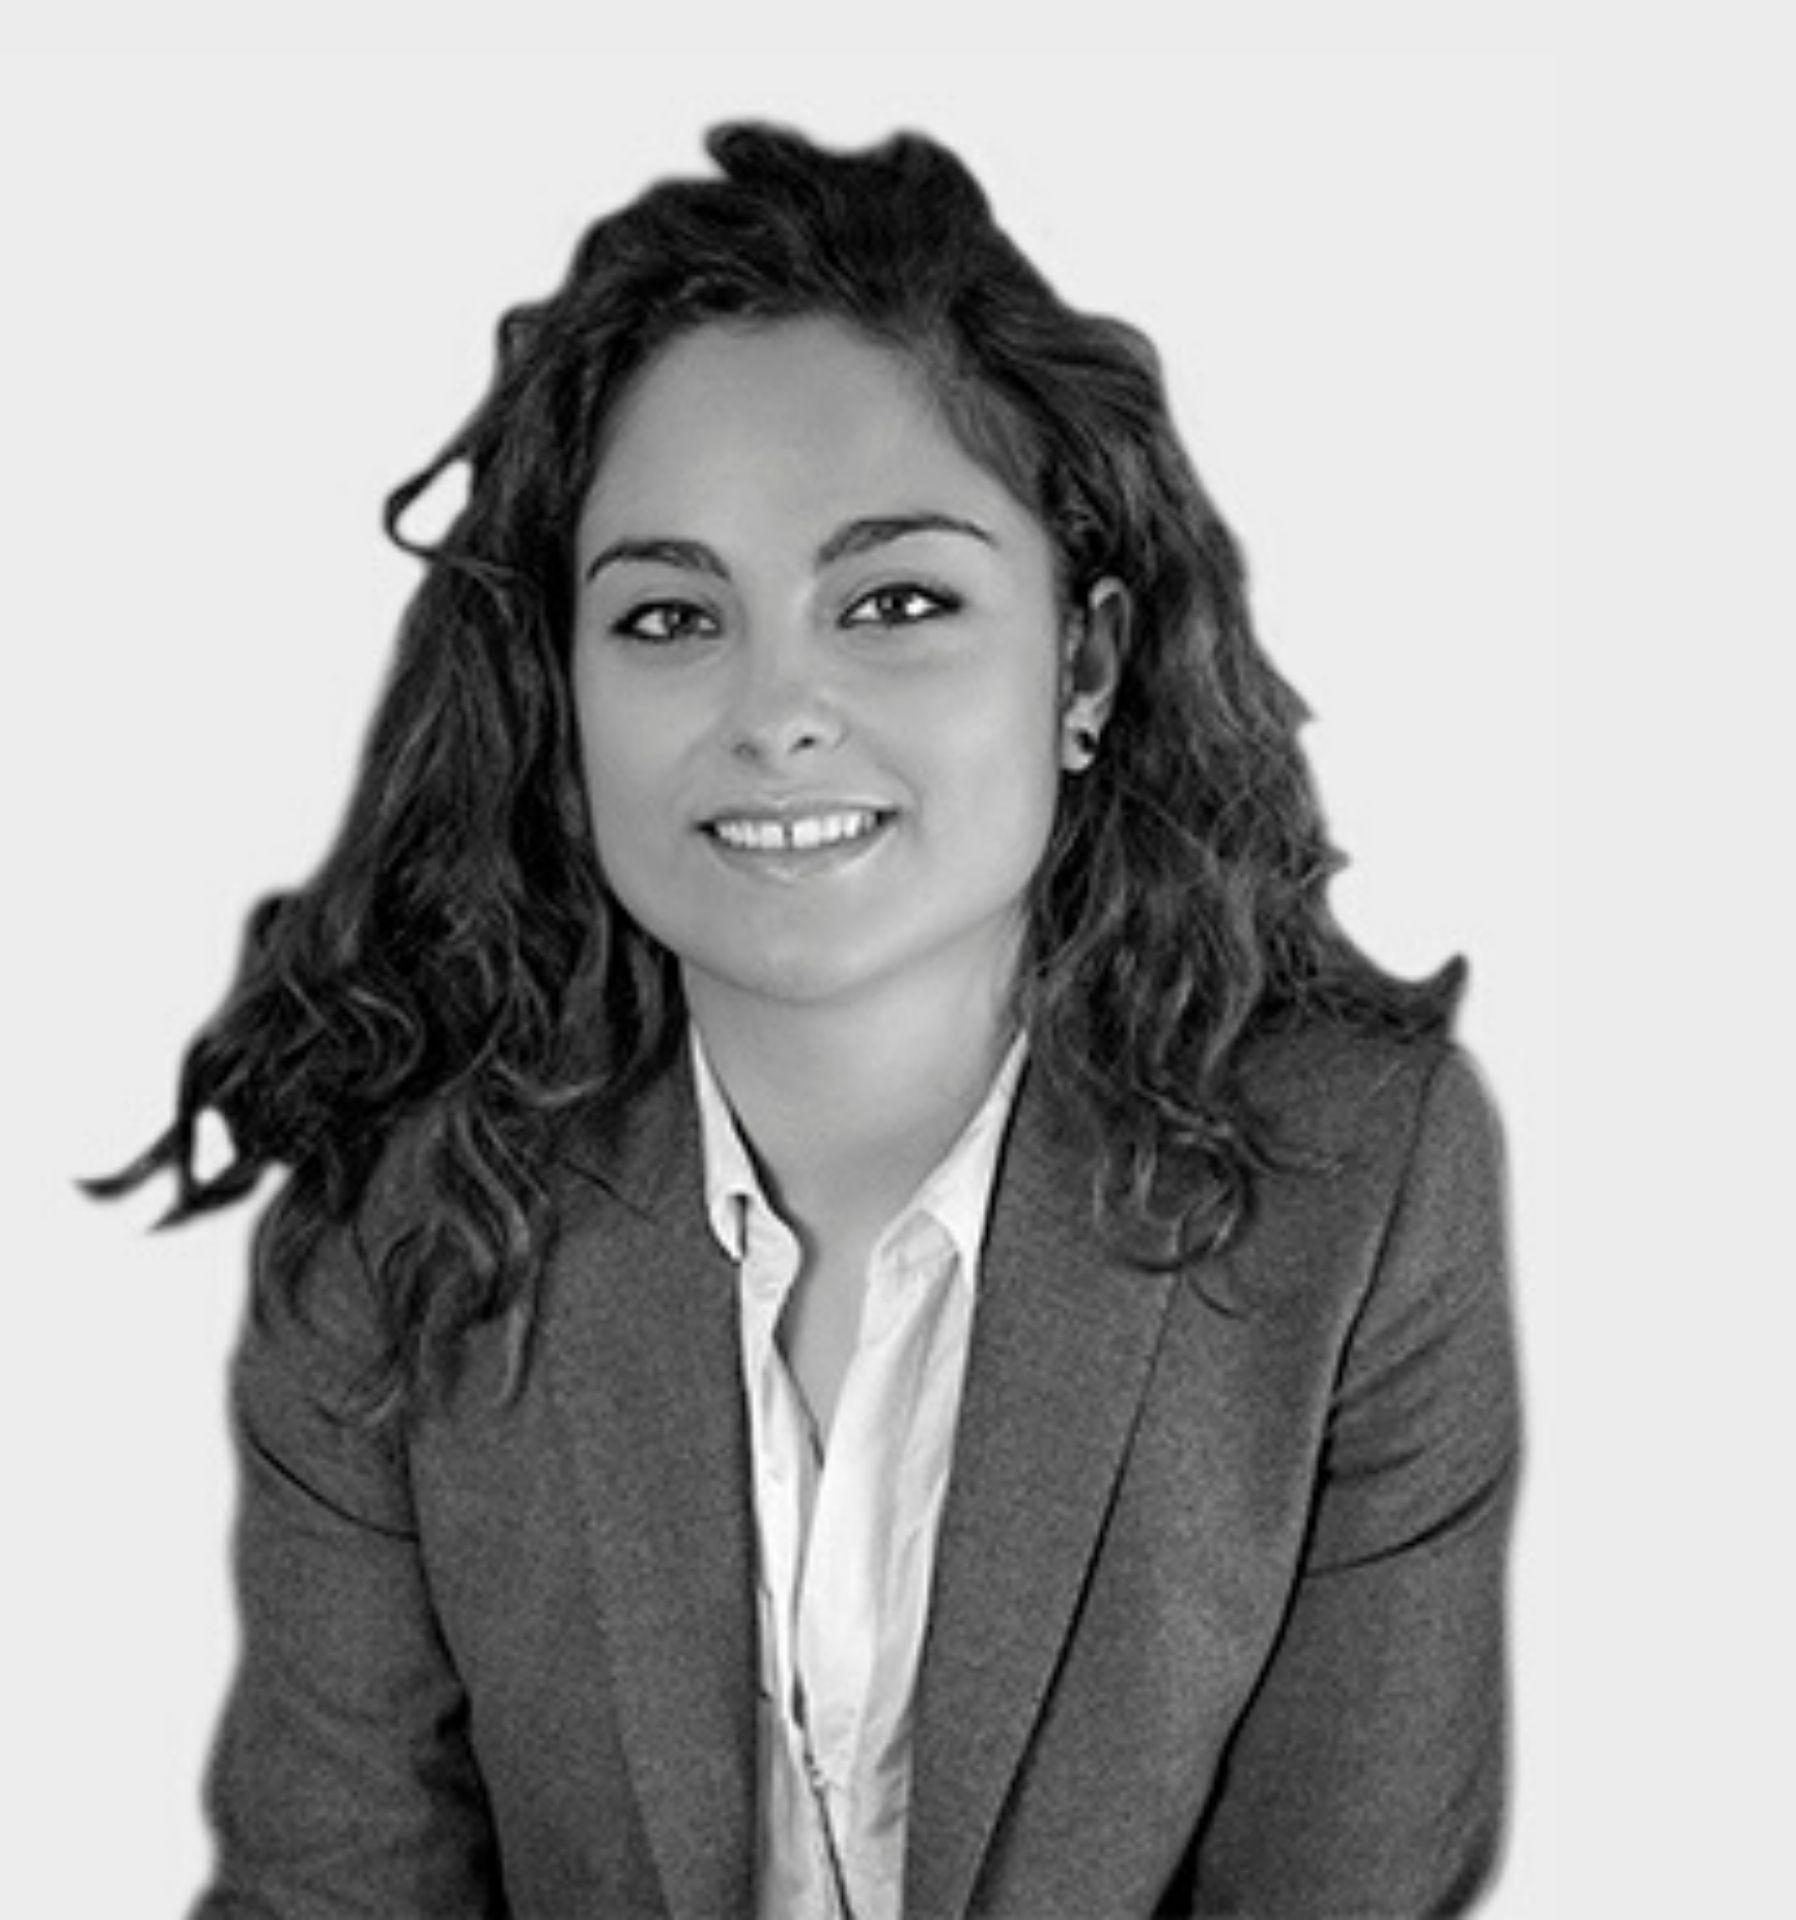 Leticia Remírez